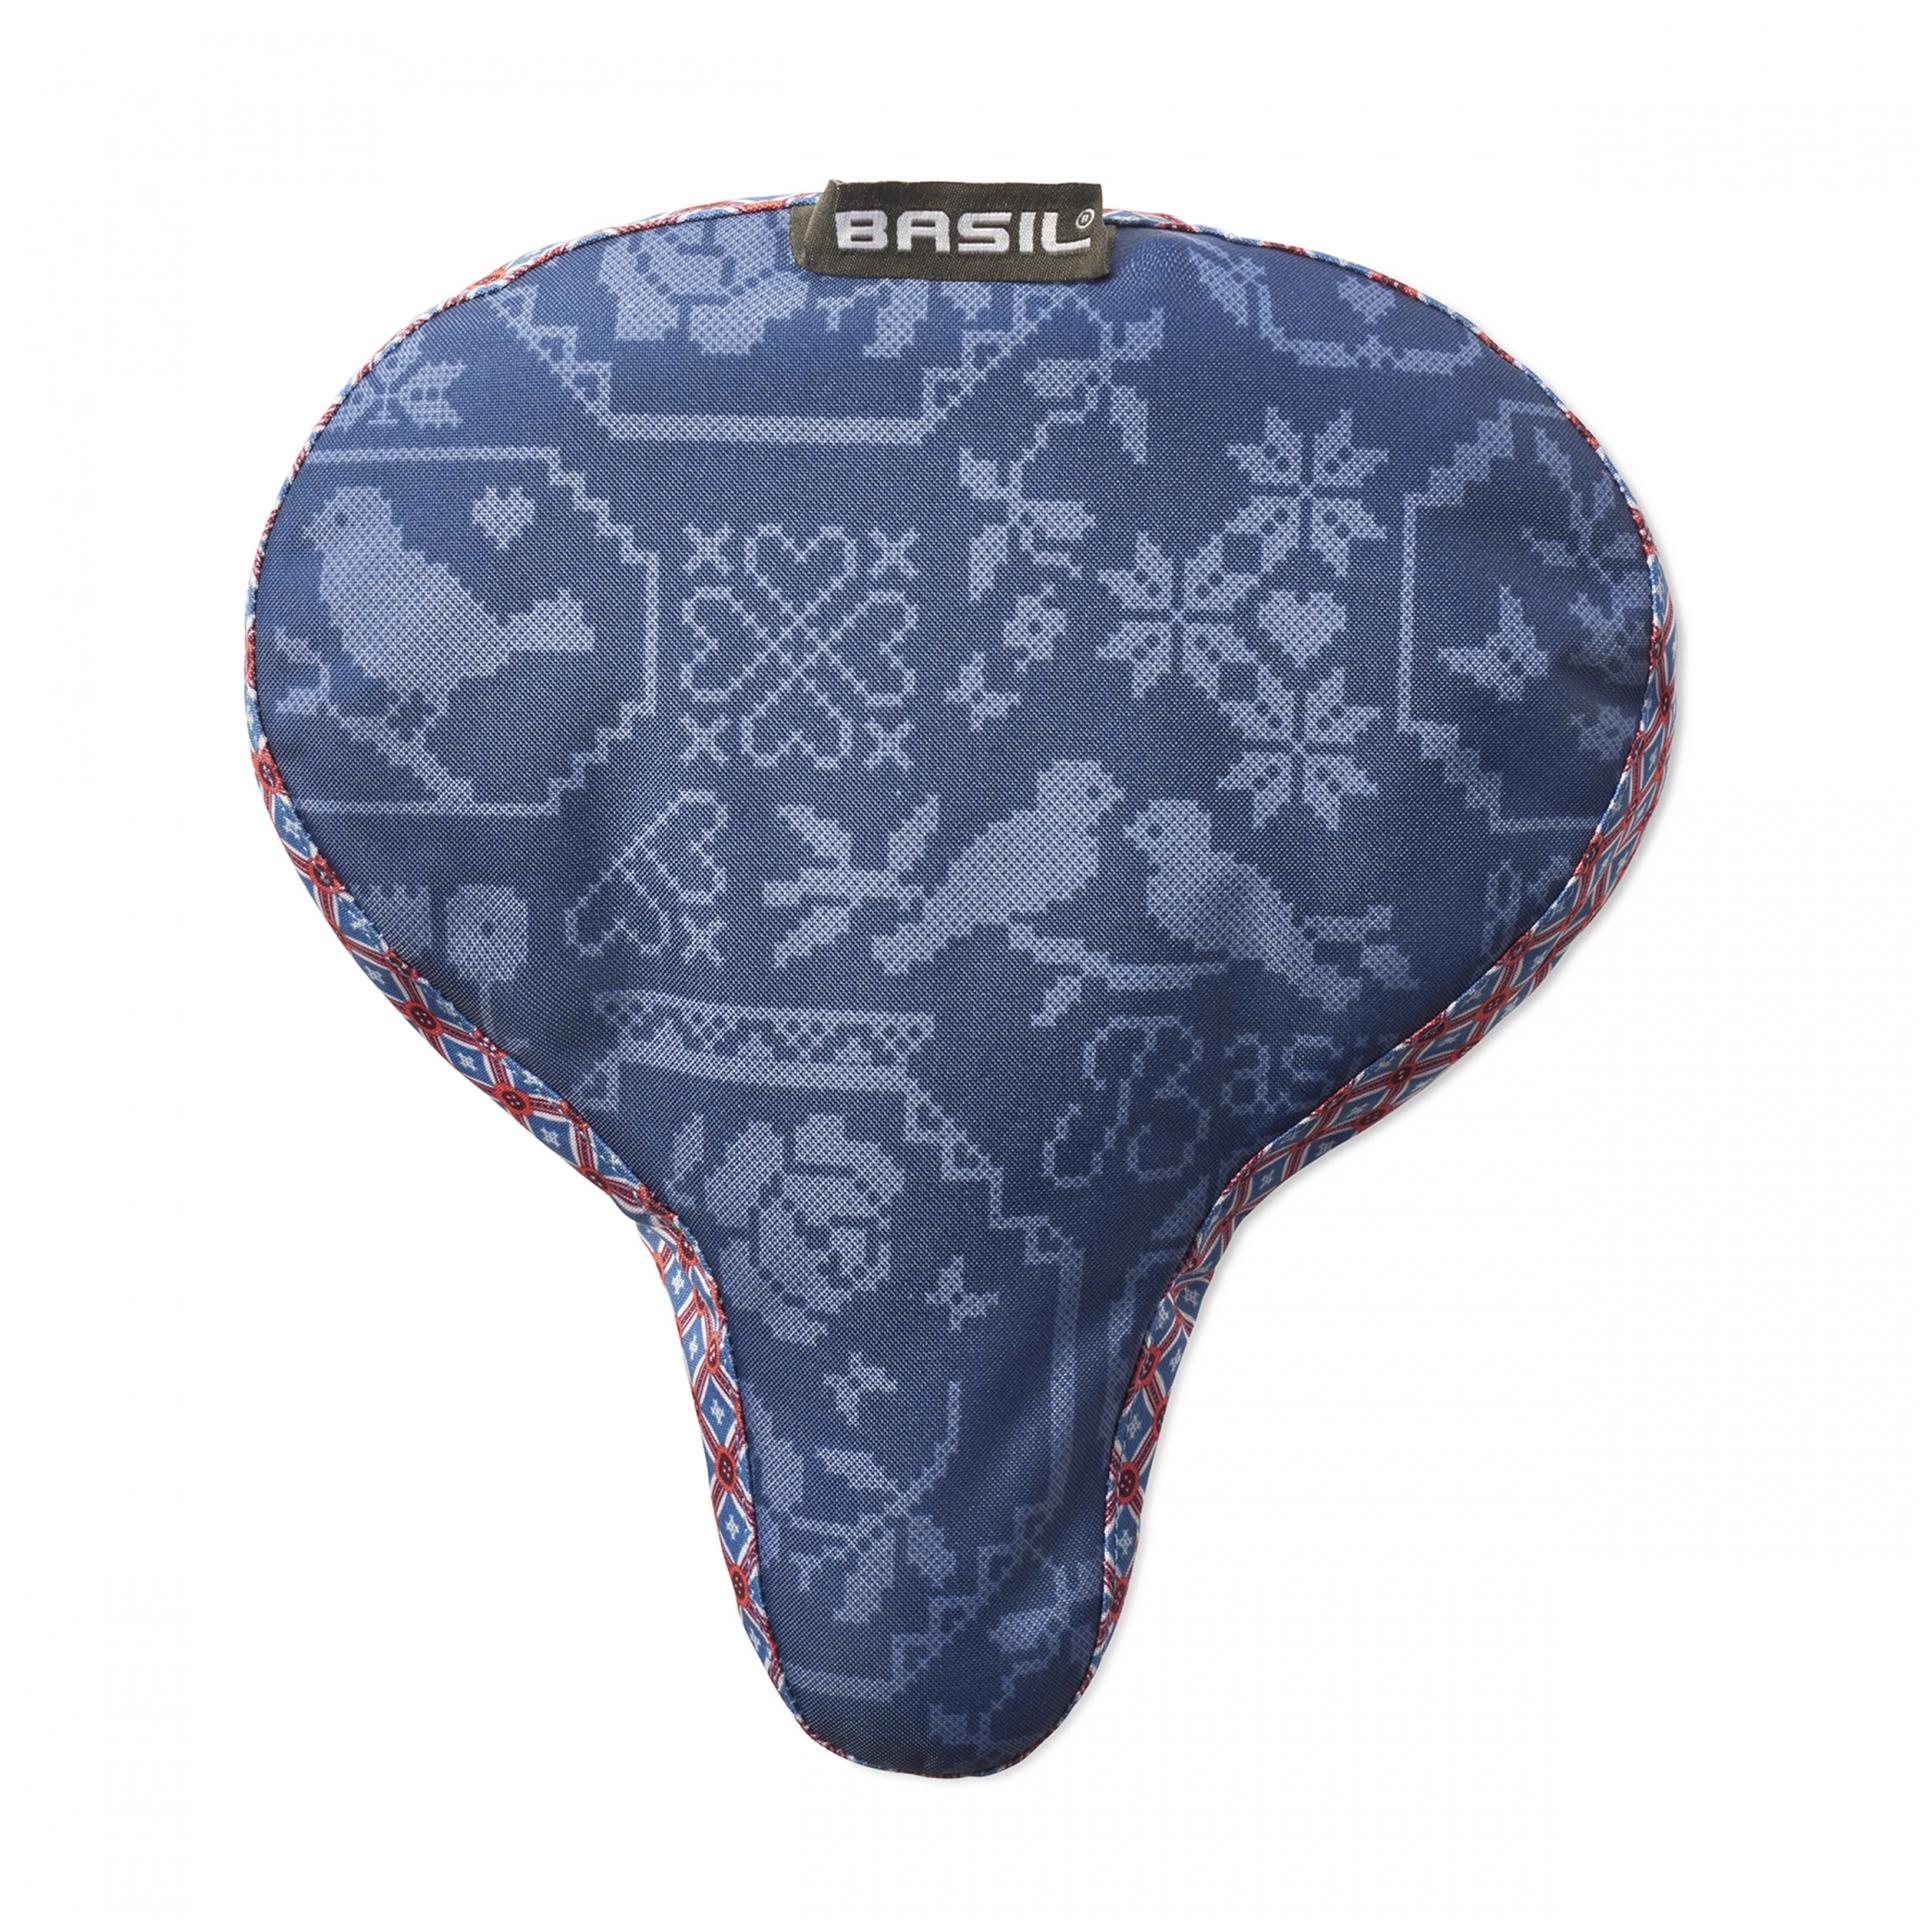 Couvre-selle BASIL Boheme Bleu Indigo